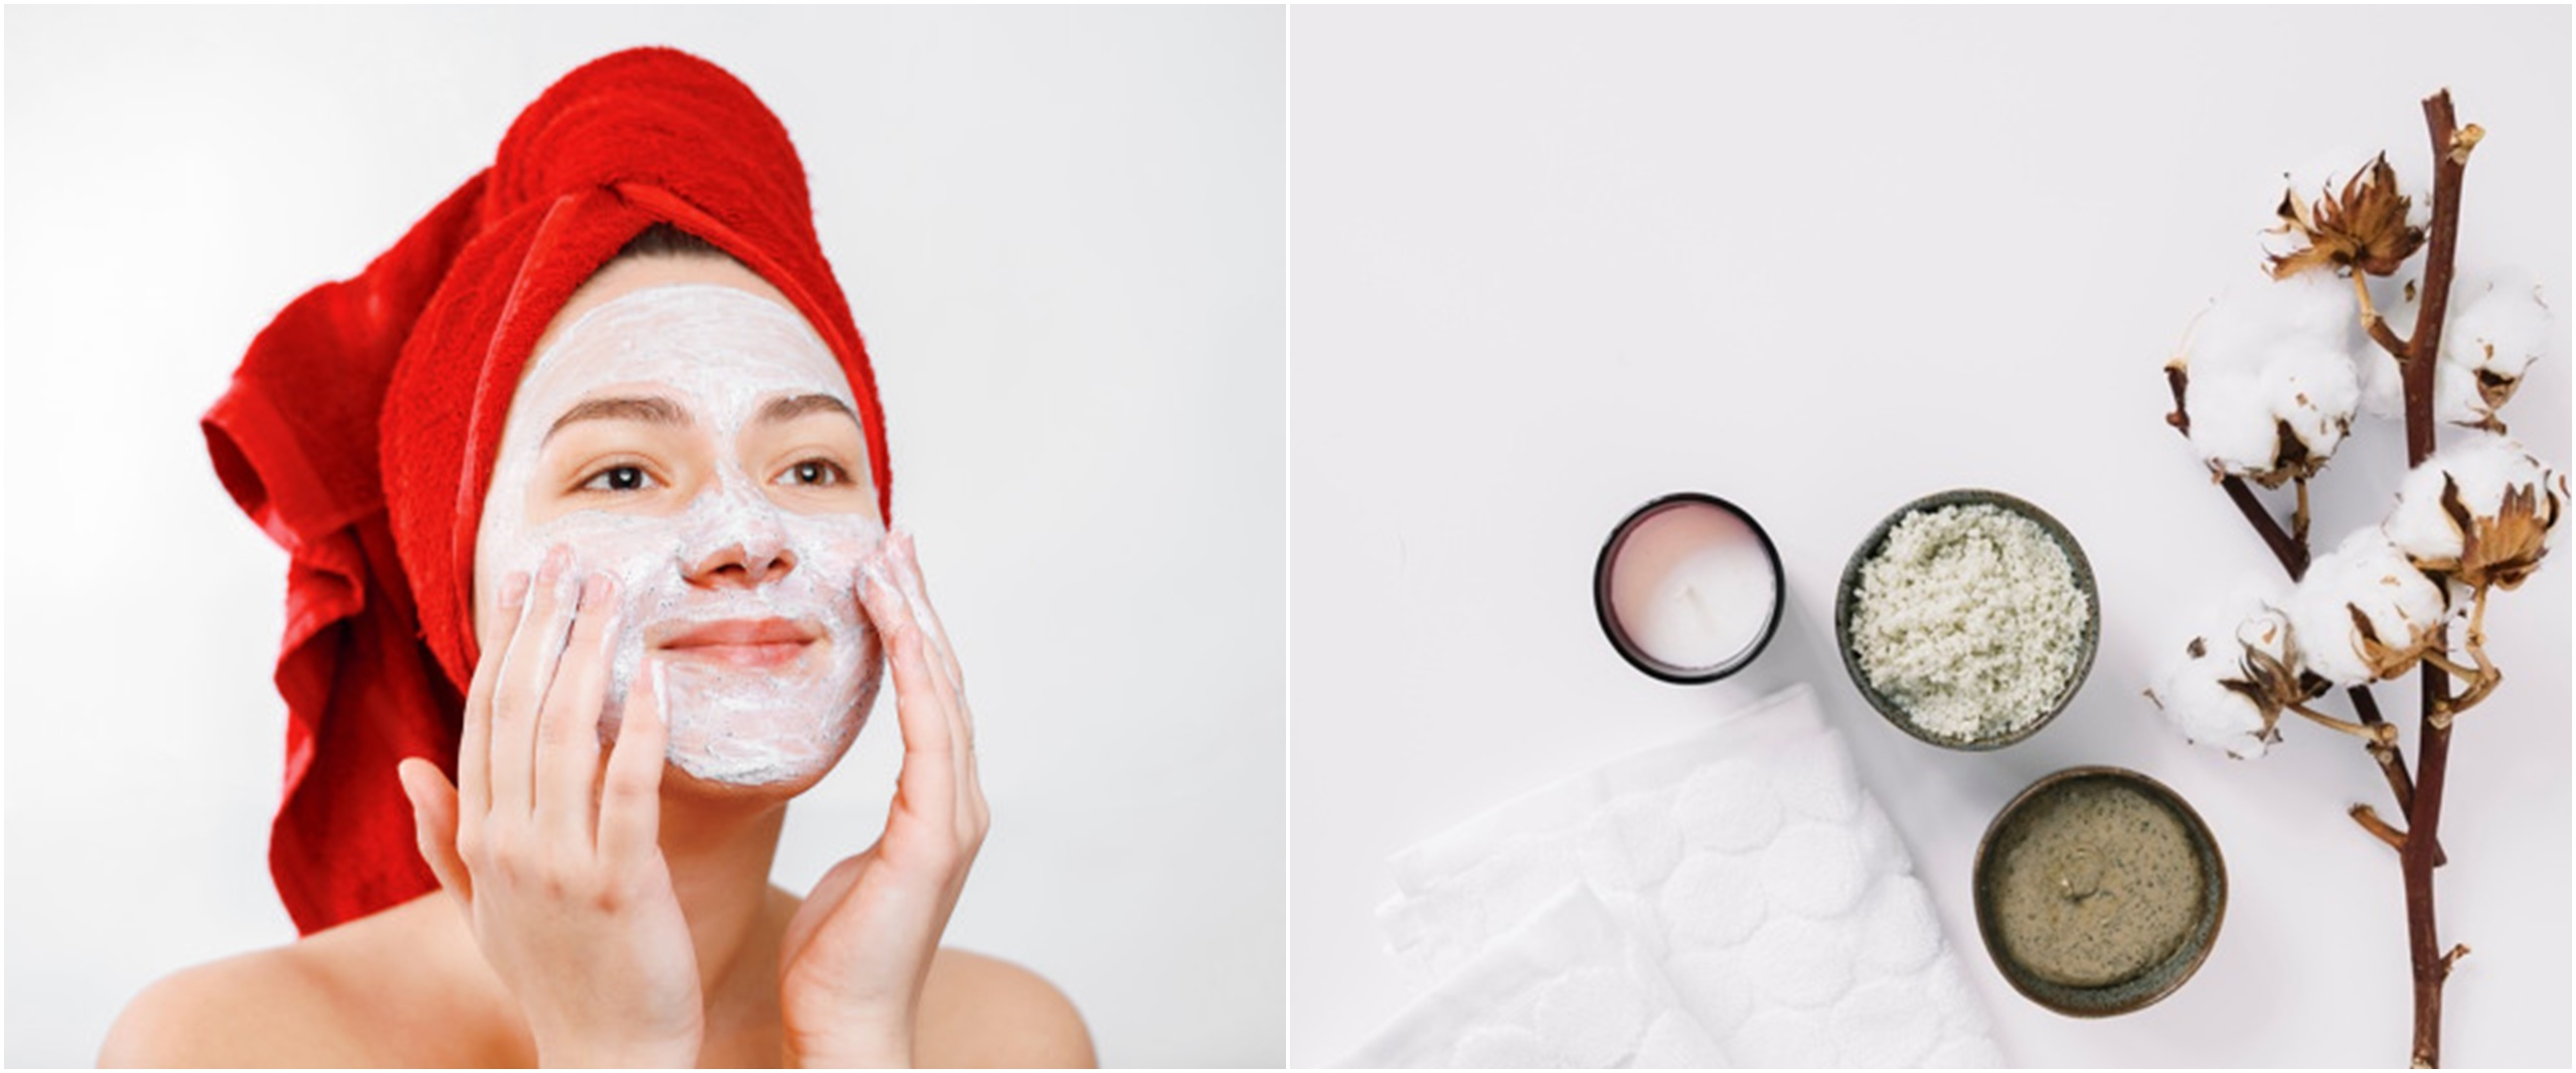 8 Cara membuat face scrub dari bahan alami, bikin glowing